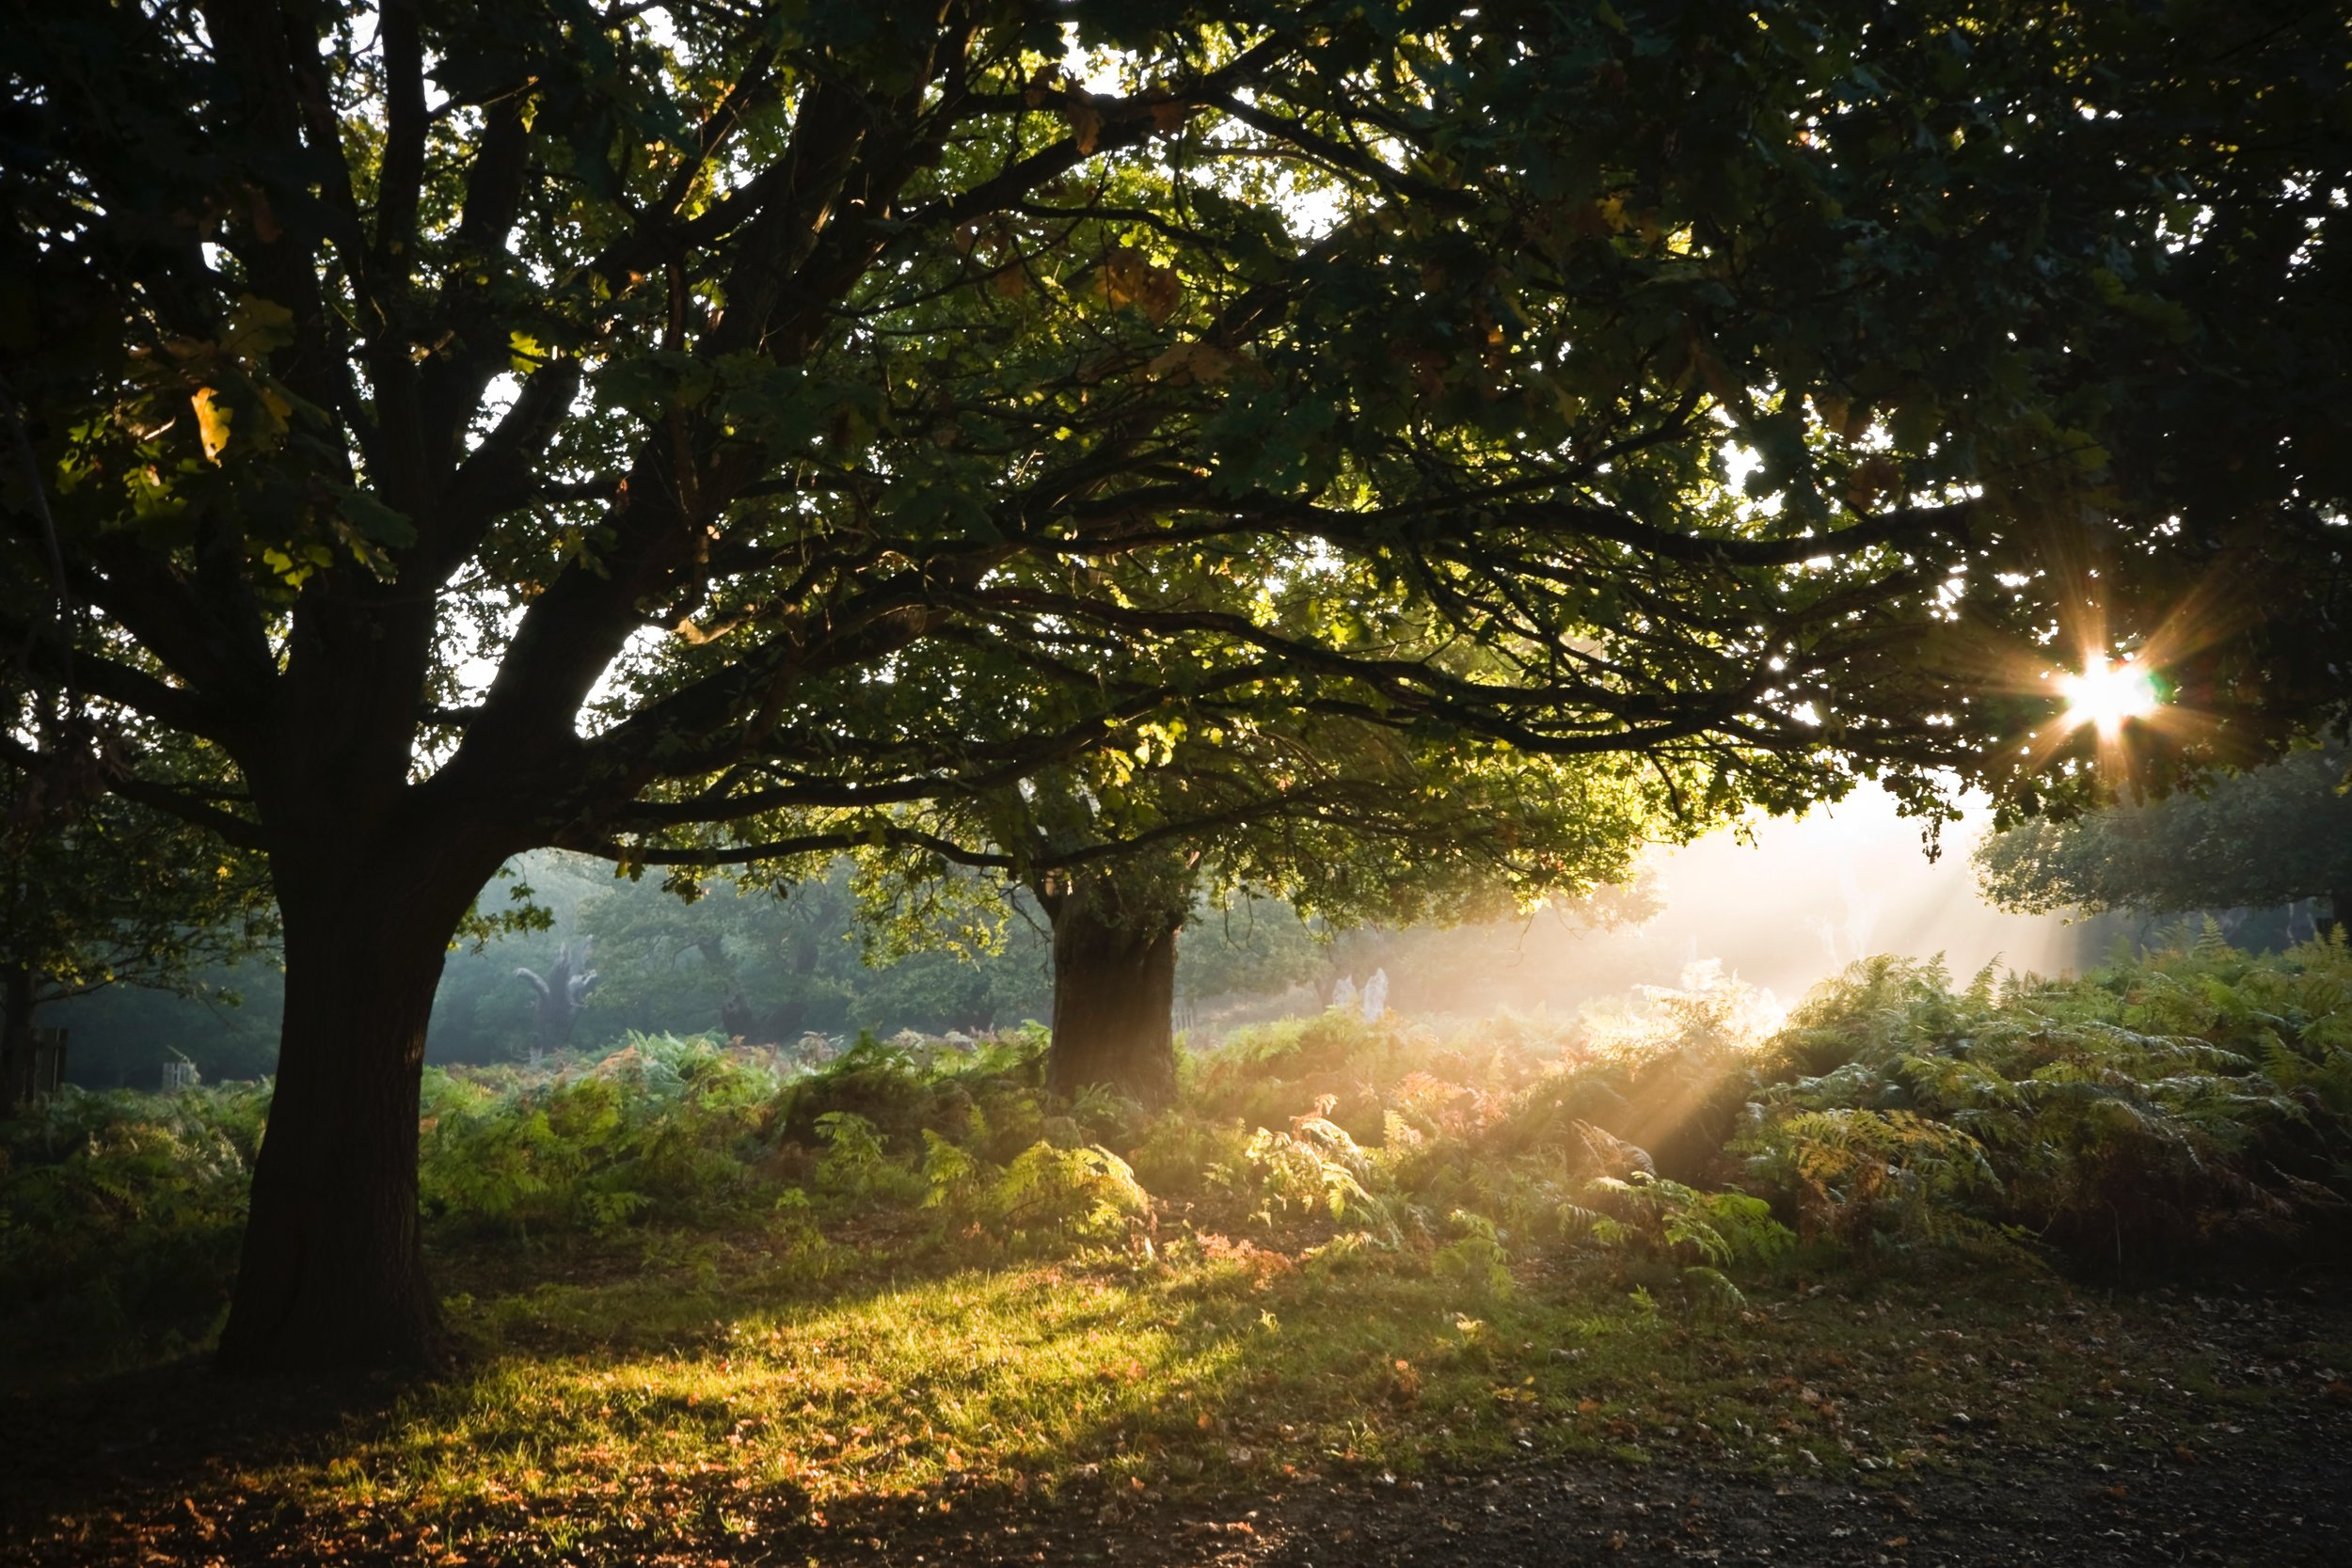 bright-dawn-daylight-1659689.jpg